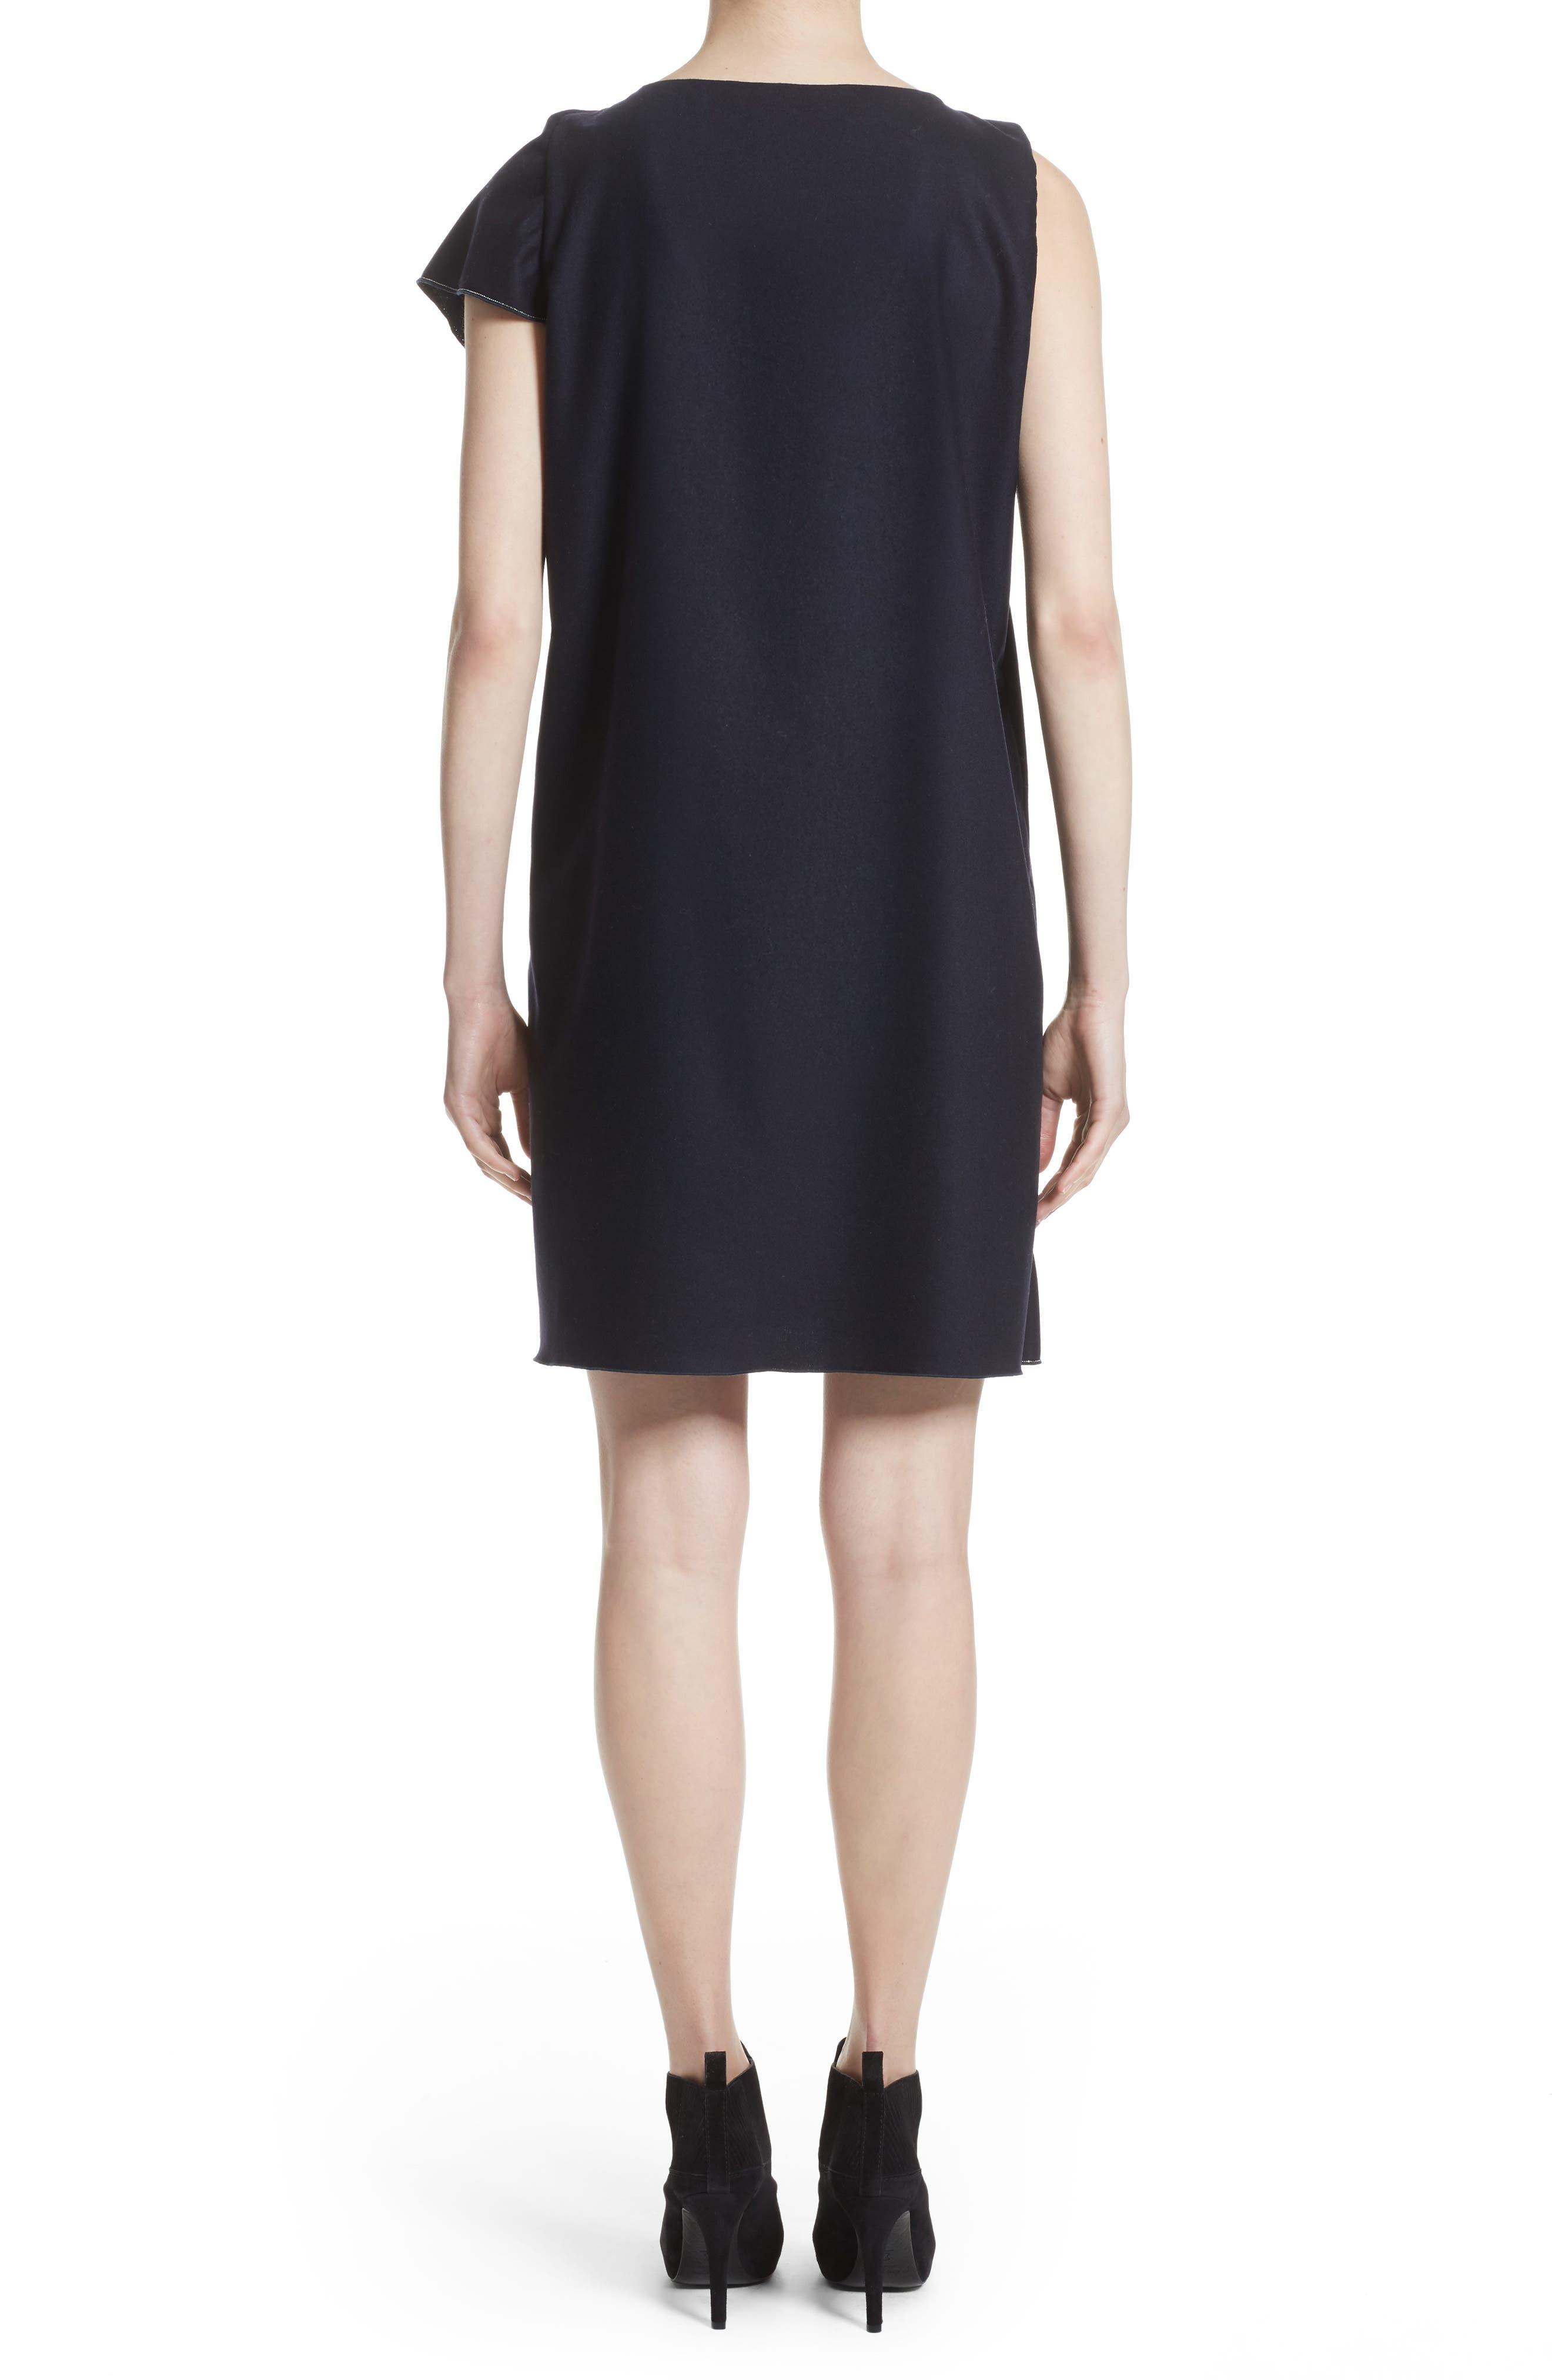 FABIANA FILIPPI,                             Stretch Wool & Cashmere Ruffle Dress,                             Alternate thumbnail 2, color,                             400